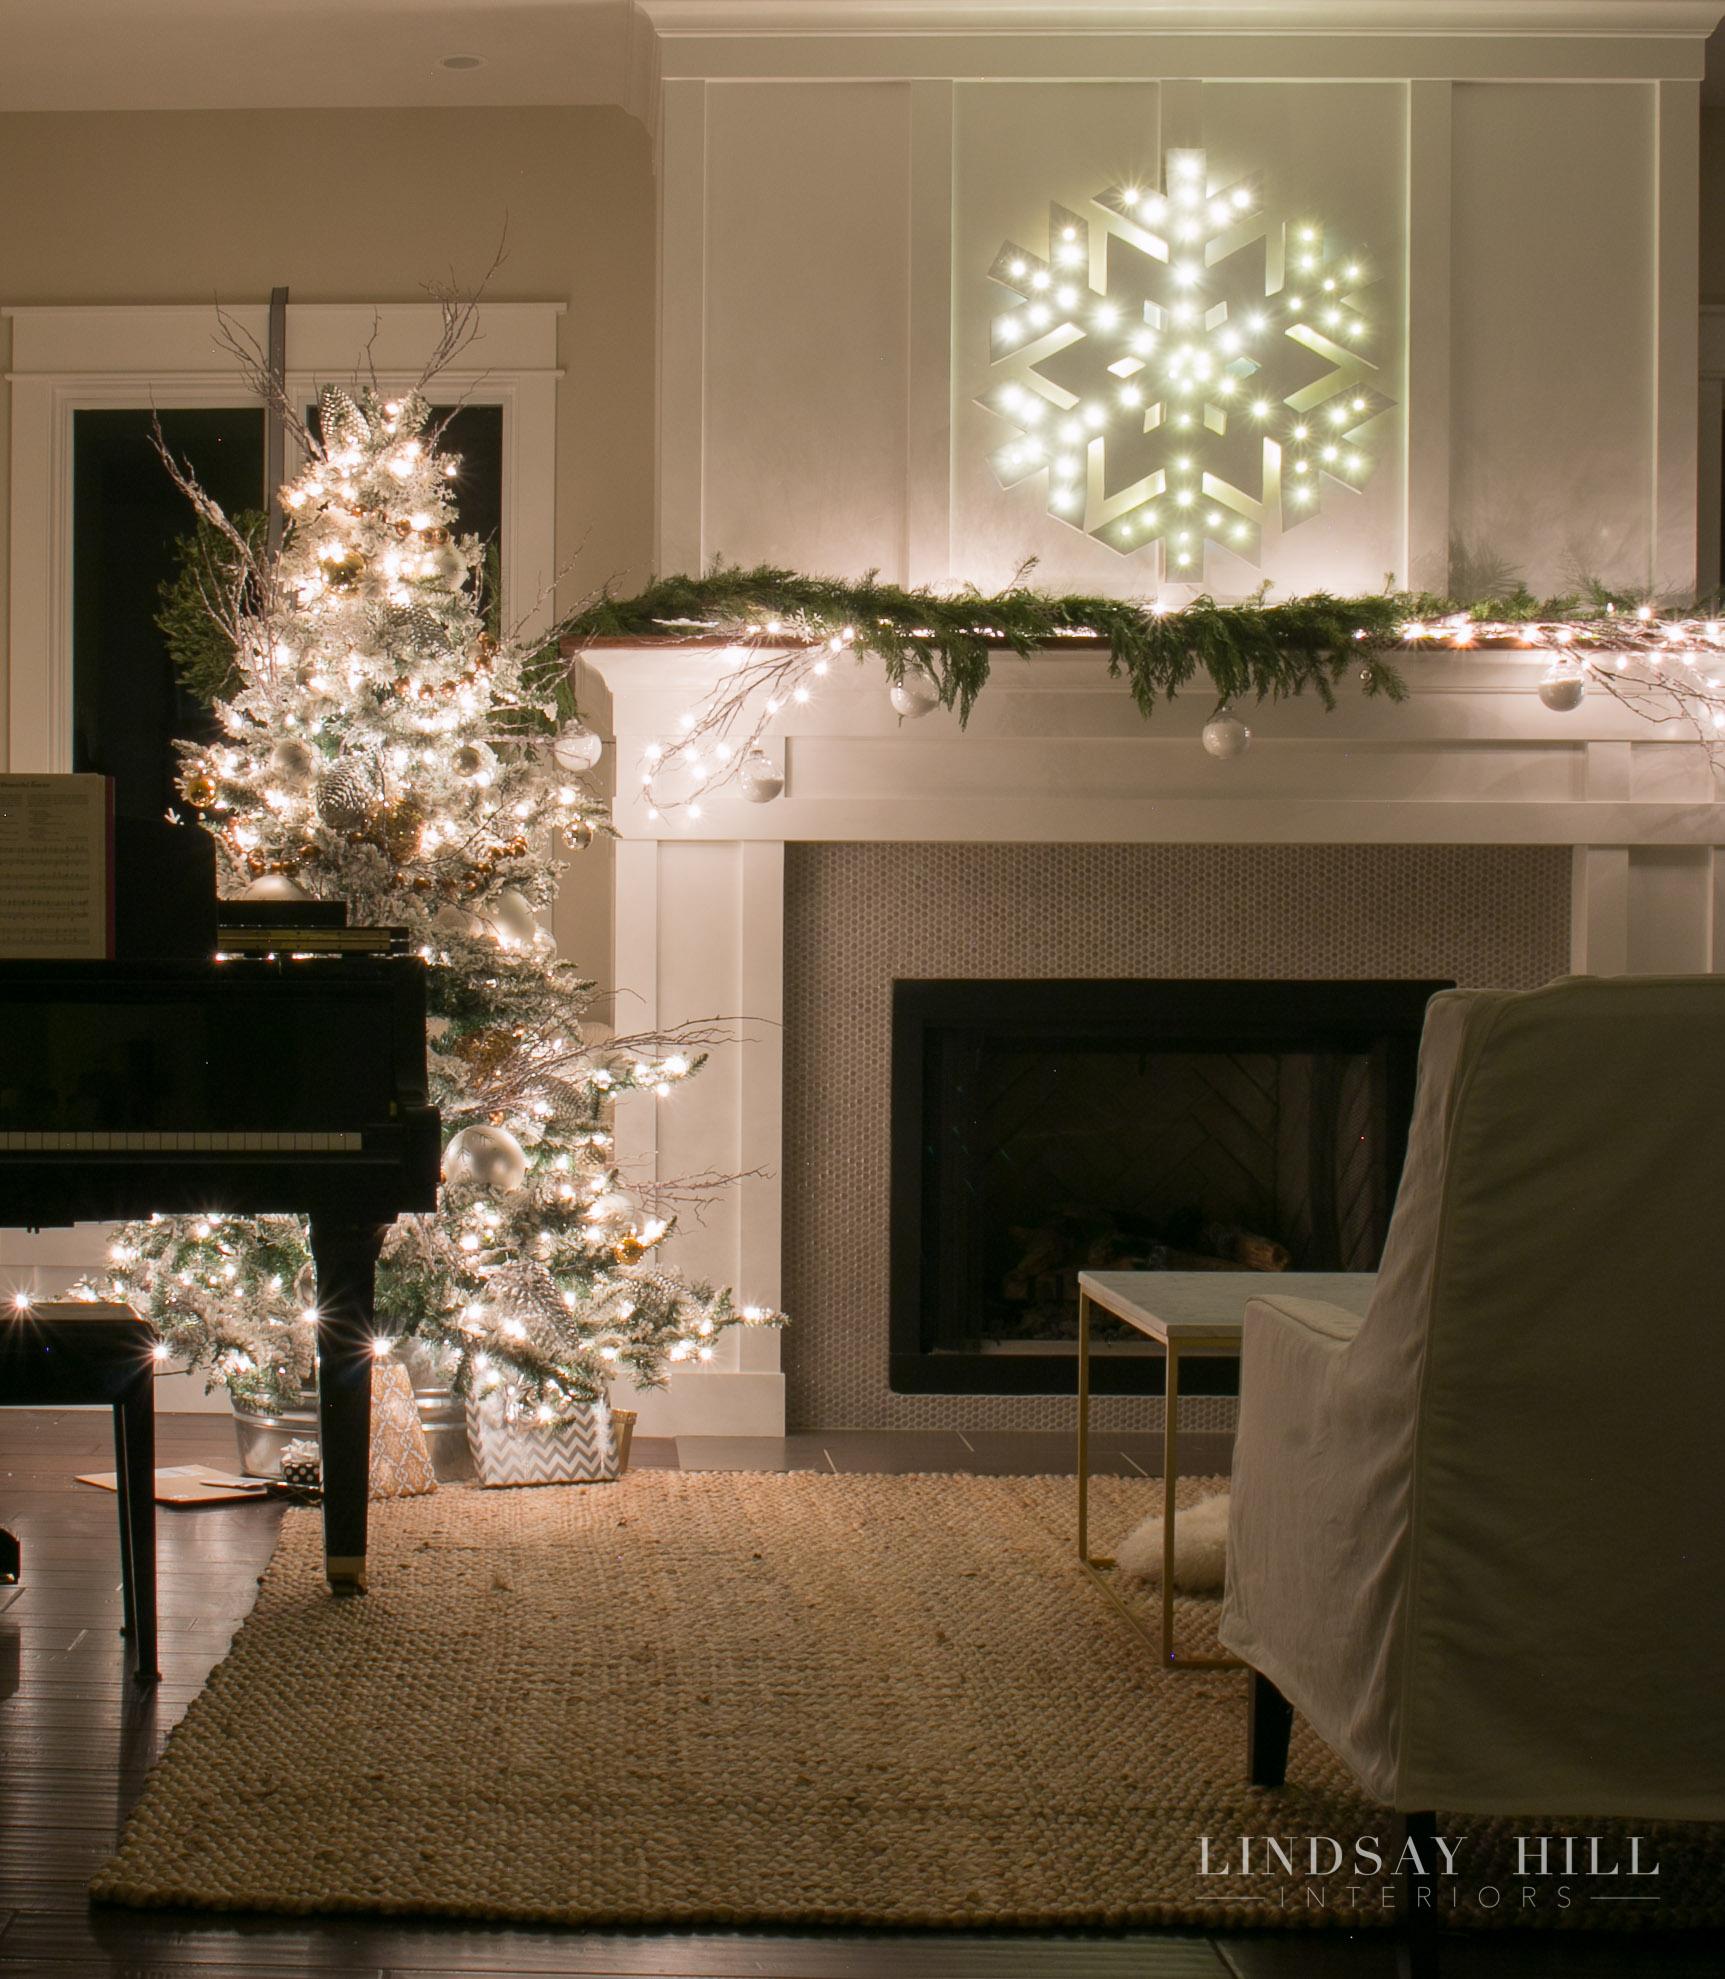 lindsay hill interiors Christmas Nights Tour